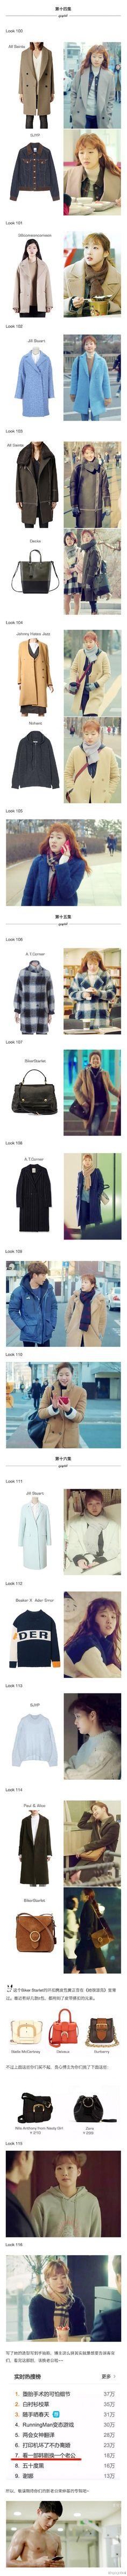 《乳酪陷阱》大啊啊啊科普|看看人家怎麼把不貴的衣服穿漂亮 Uni Outfits, Korean Outfits, Fall Outfits, Fashion Outfits, Fashion Trends, Kim Go Eun Style, Anime Dress, Fashion Seasons, Korea Fashion